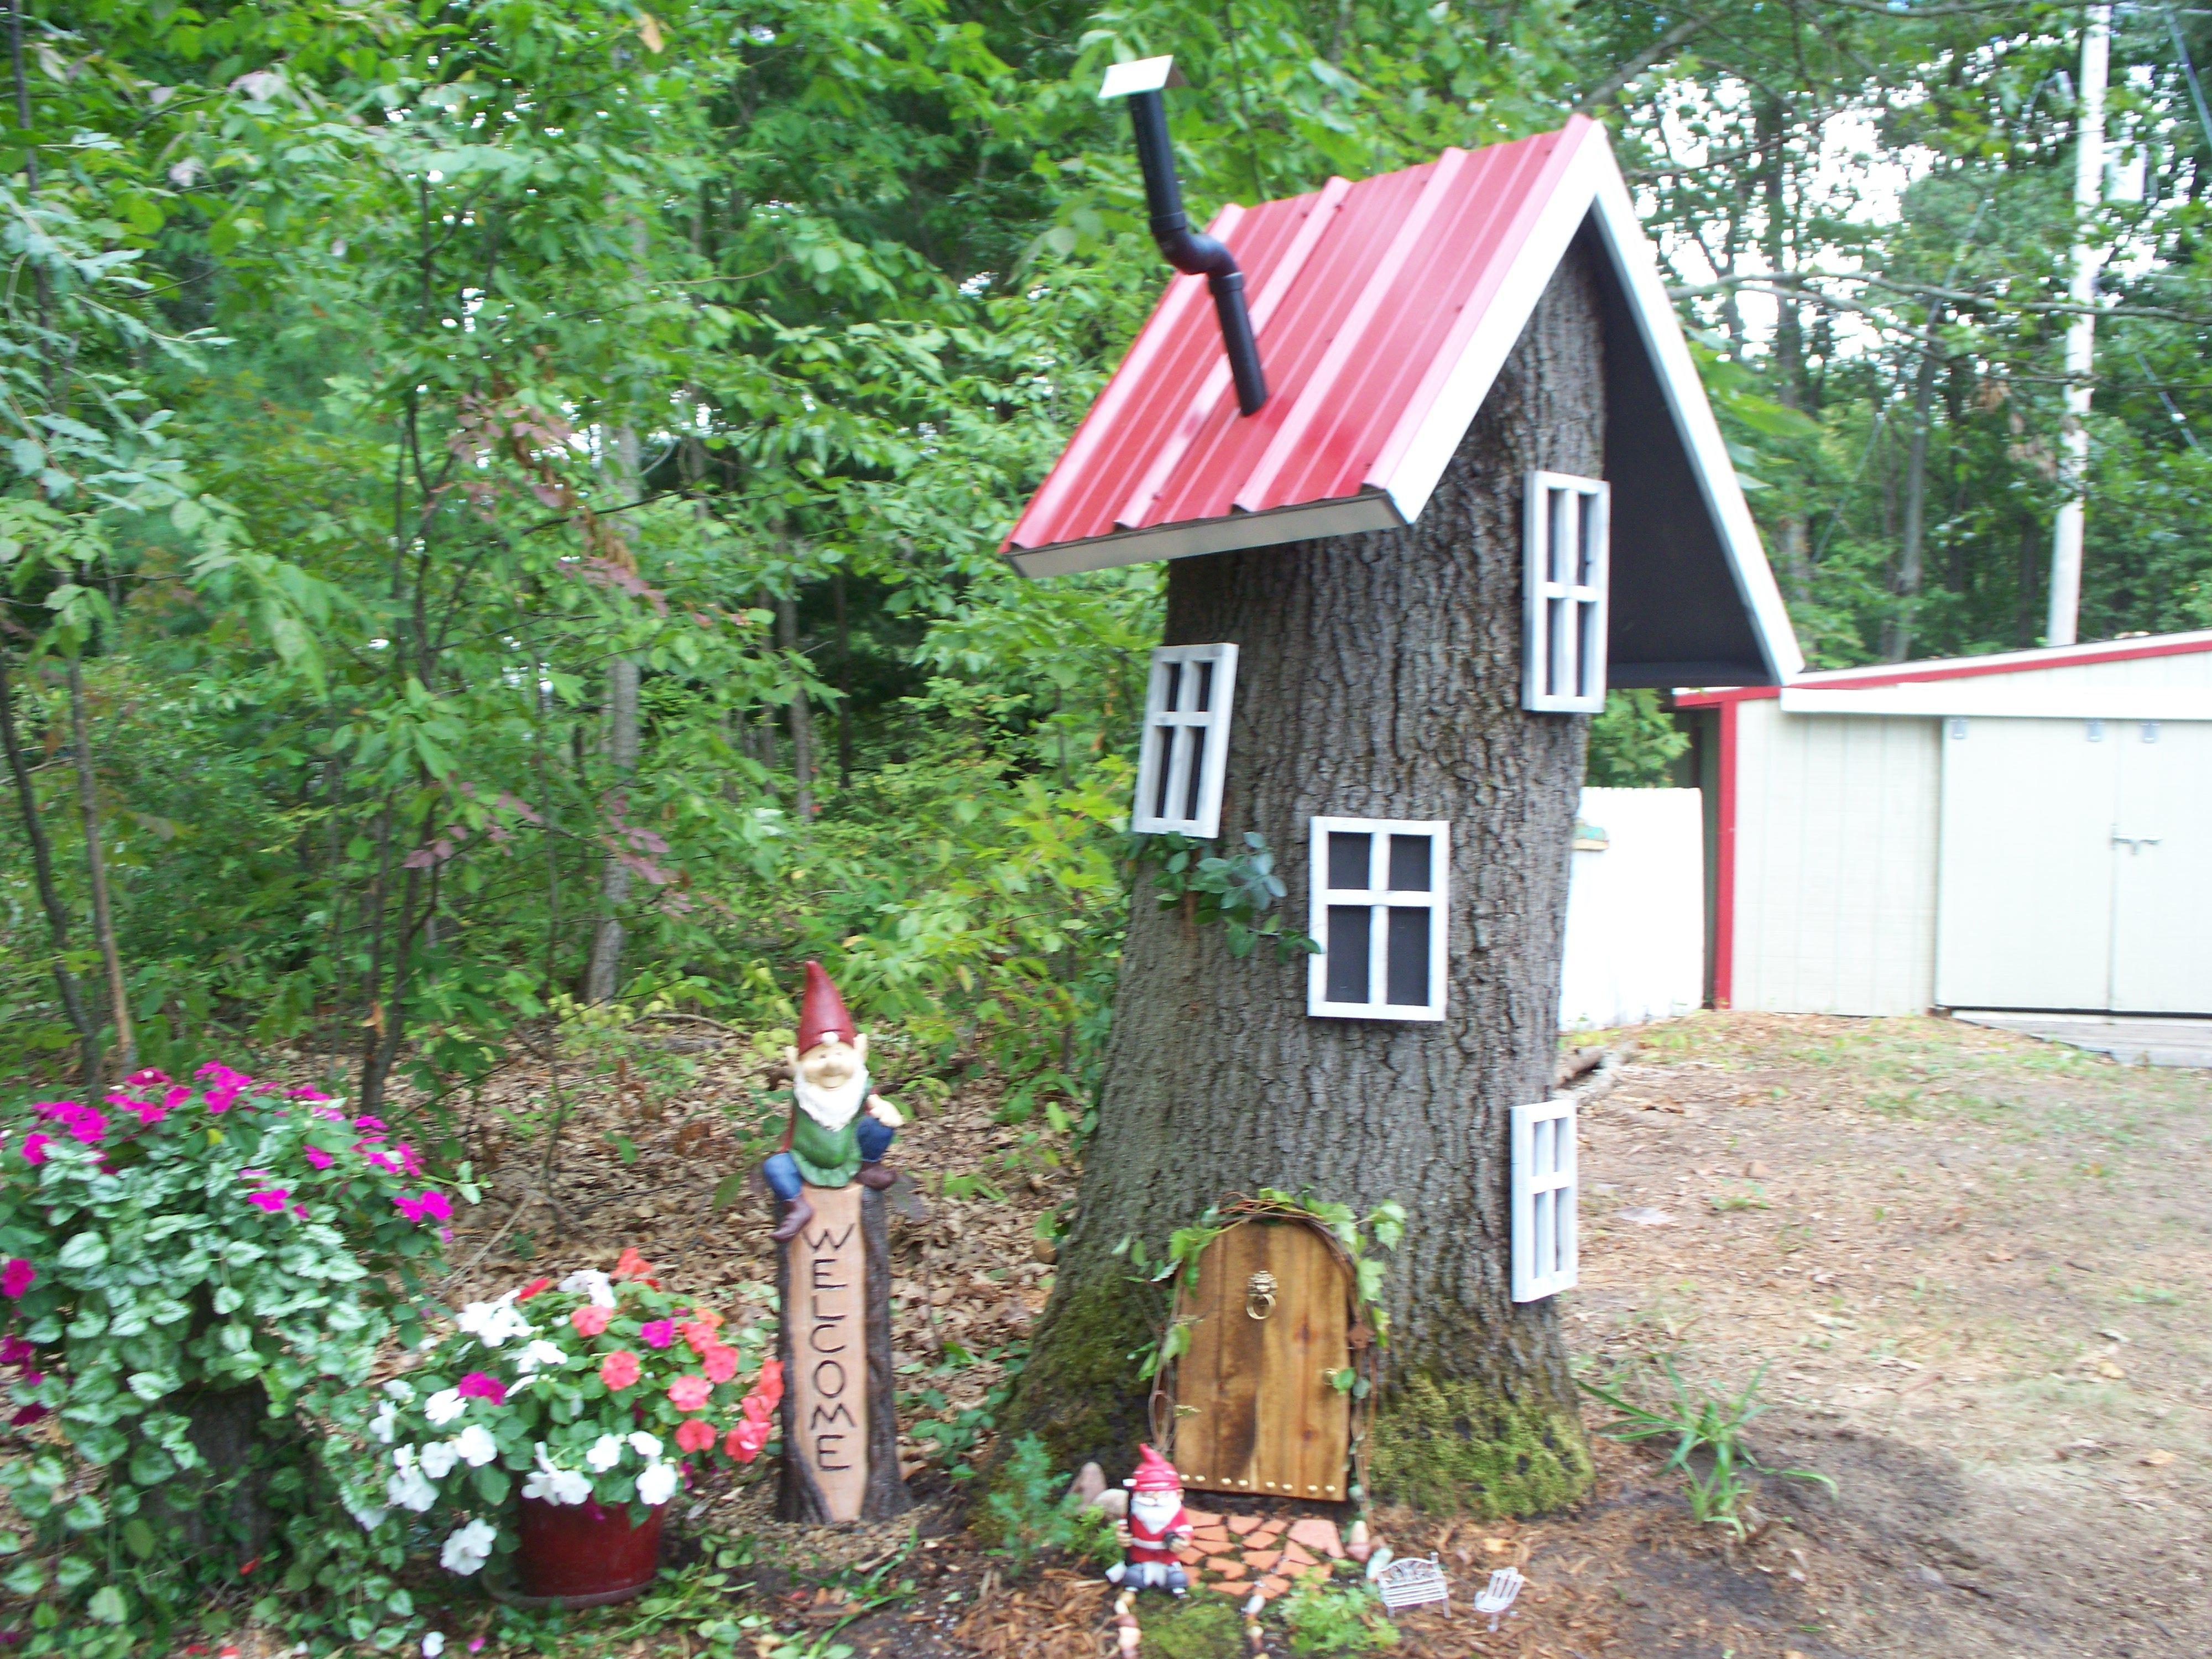 Gnome Tree Stump Home: Gnome Tree Stump House, Gnome